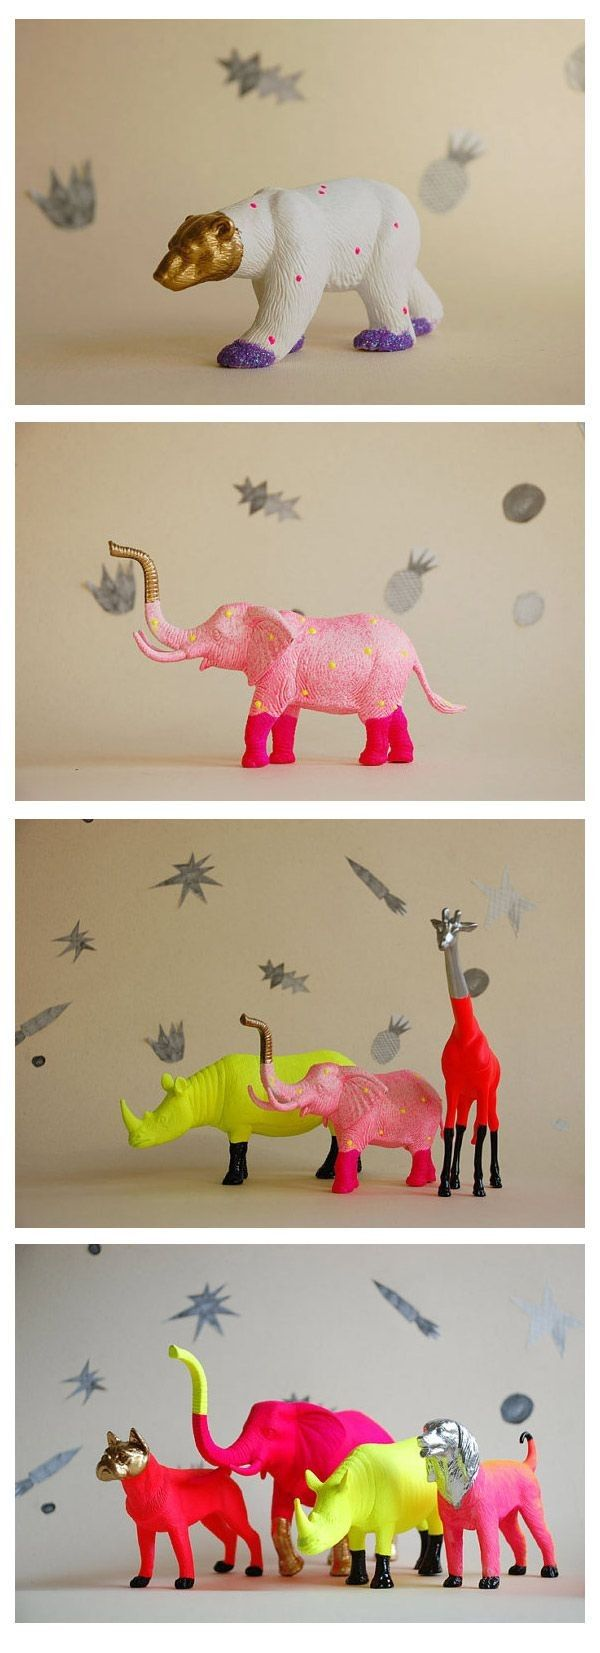 DIY Inspiration: Plastiktiere in Neonfarben angemalt // paint plastic animals in fun colors